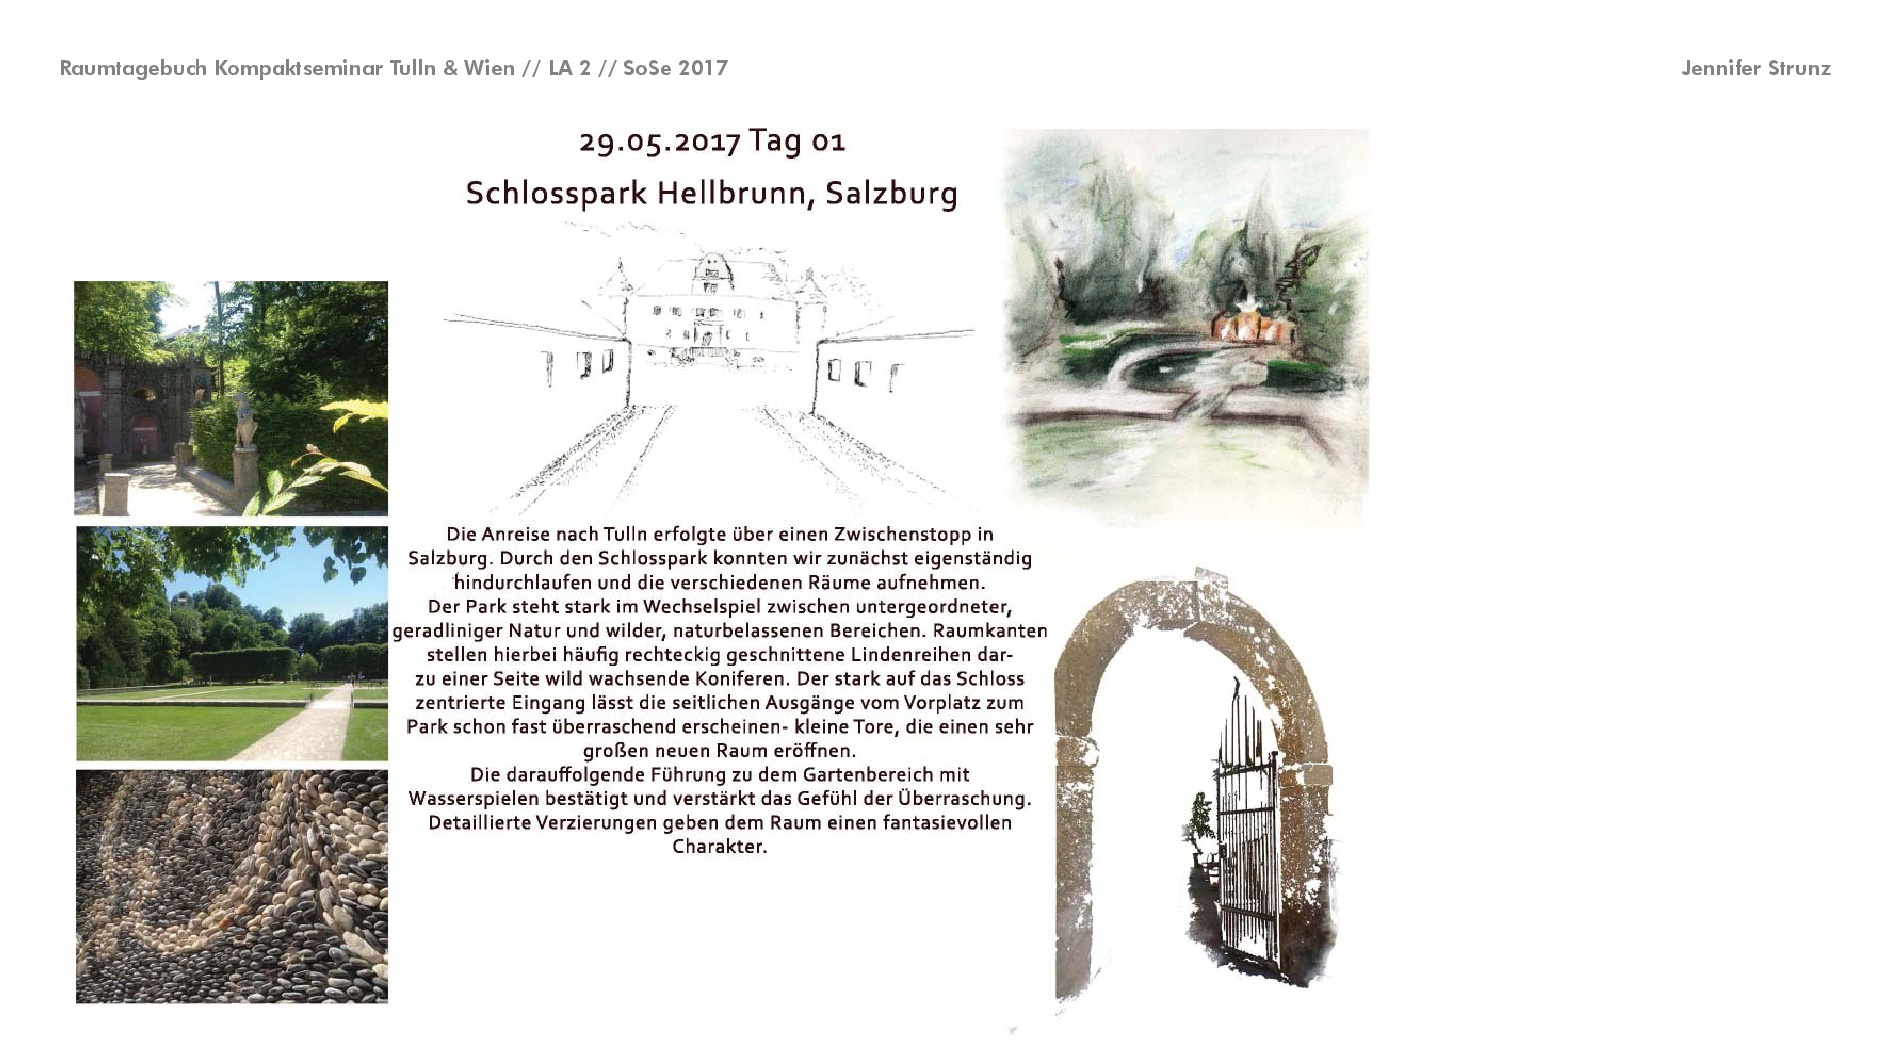 NEU Screen Raumtagebuch Tulln Wien SoSe 17 027